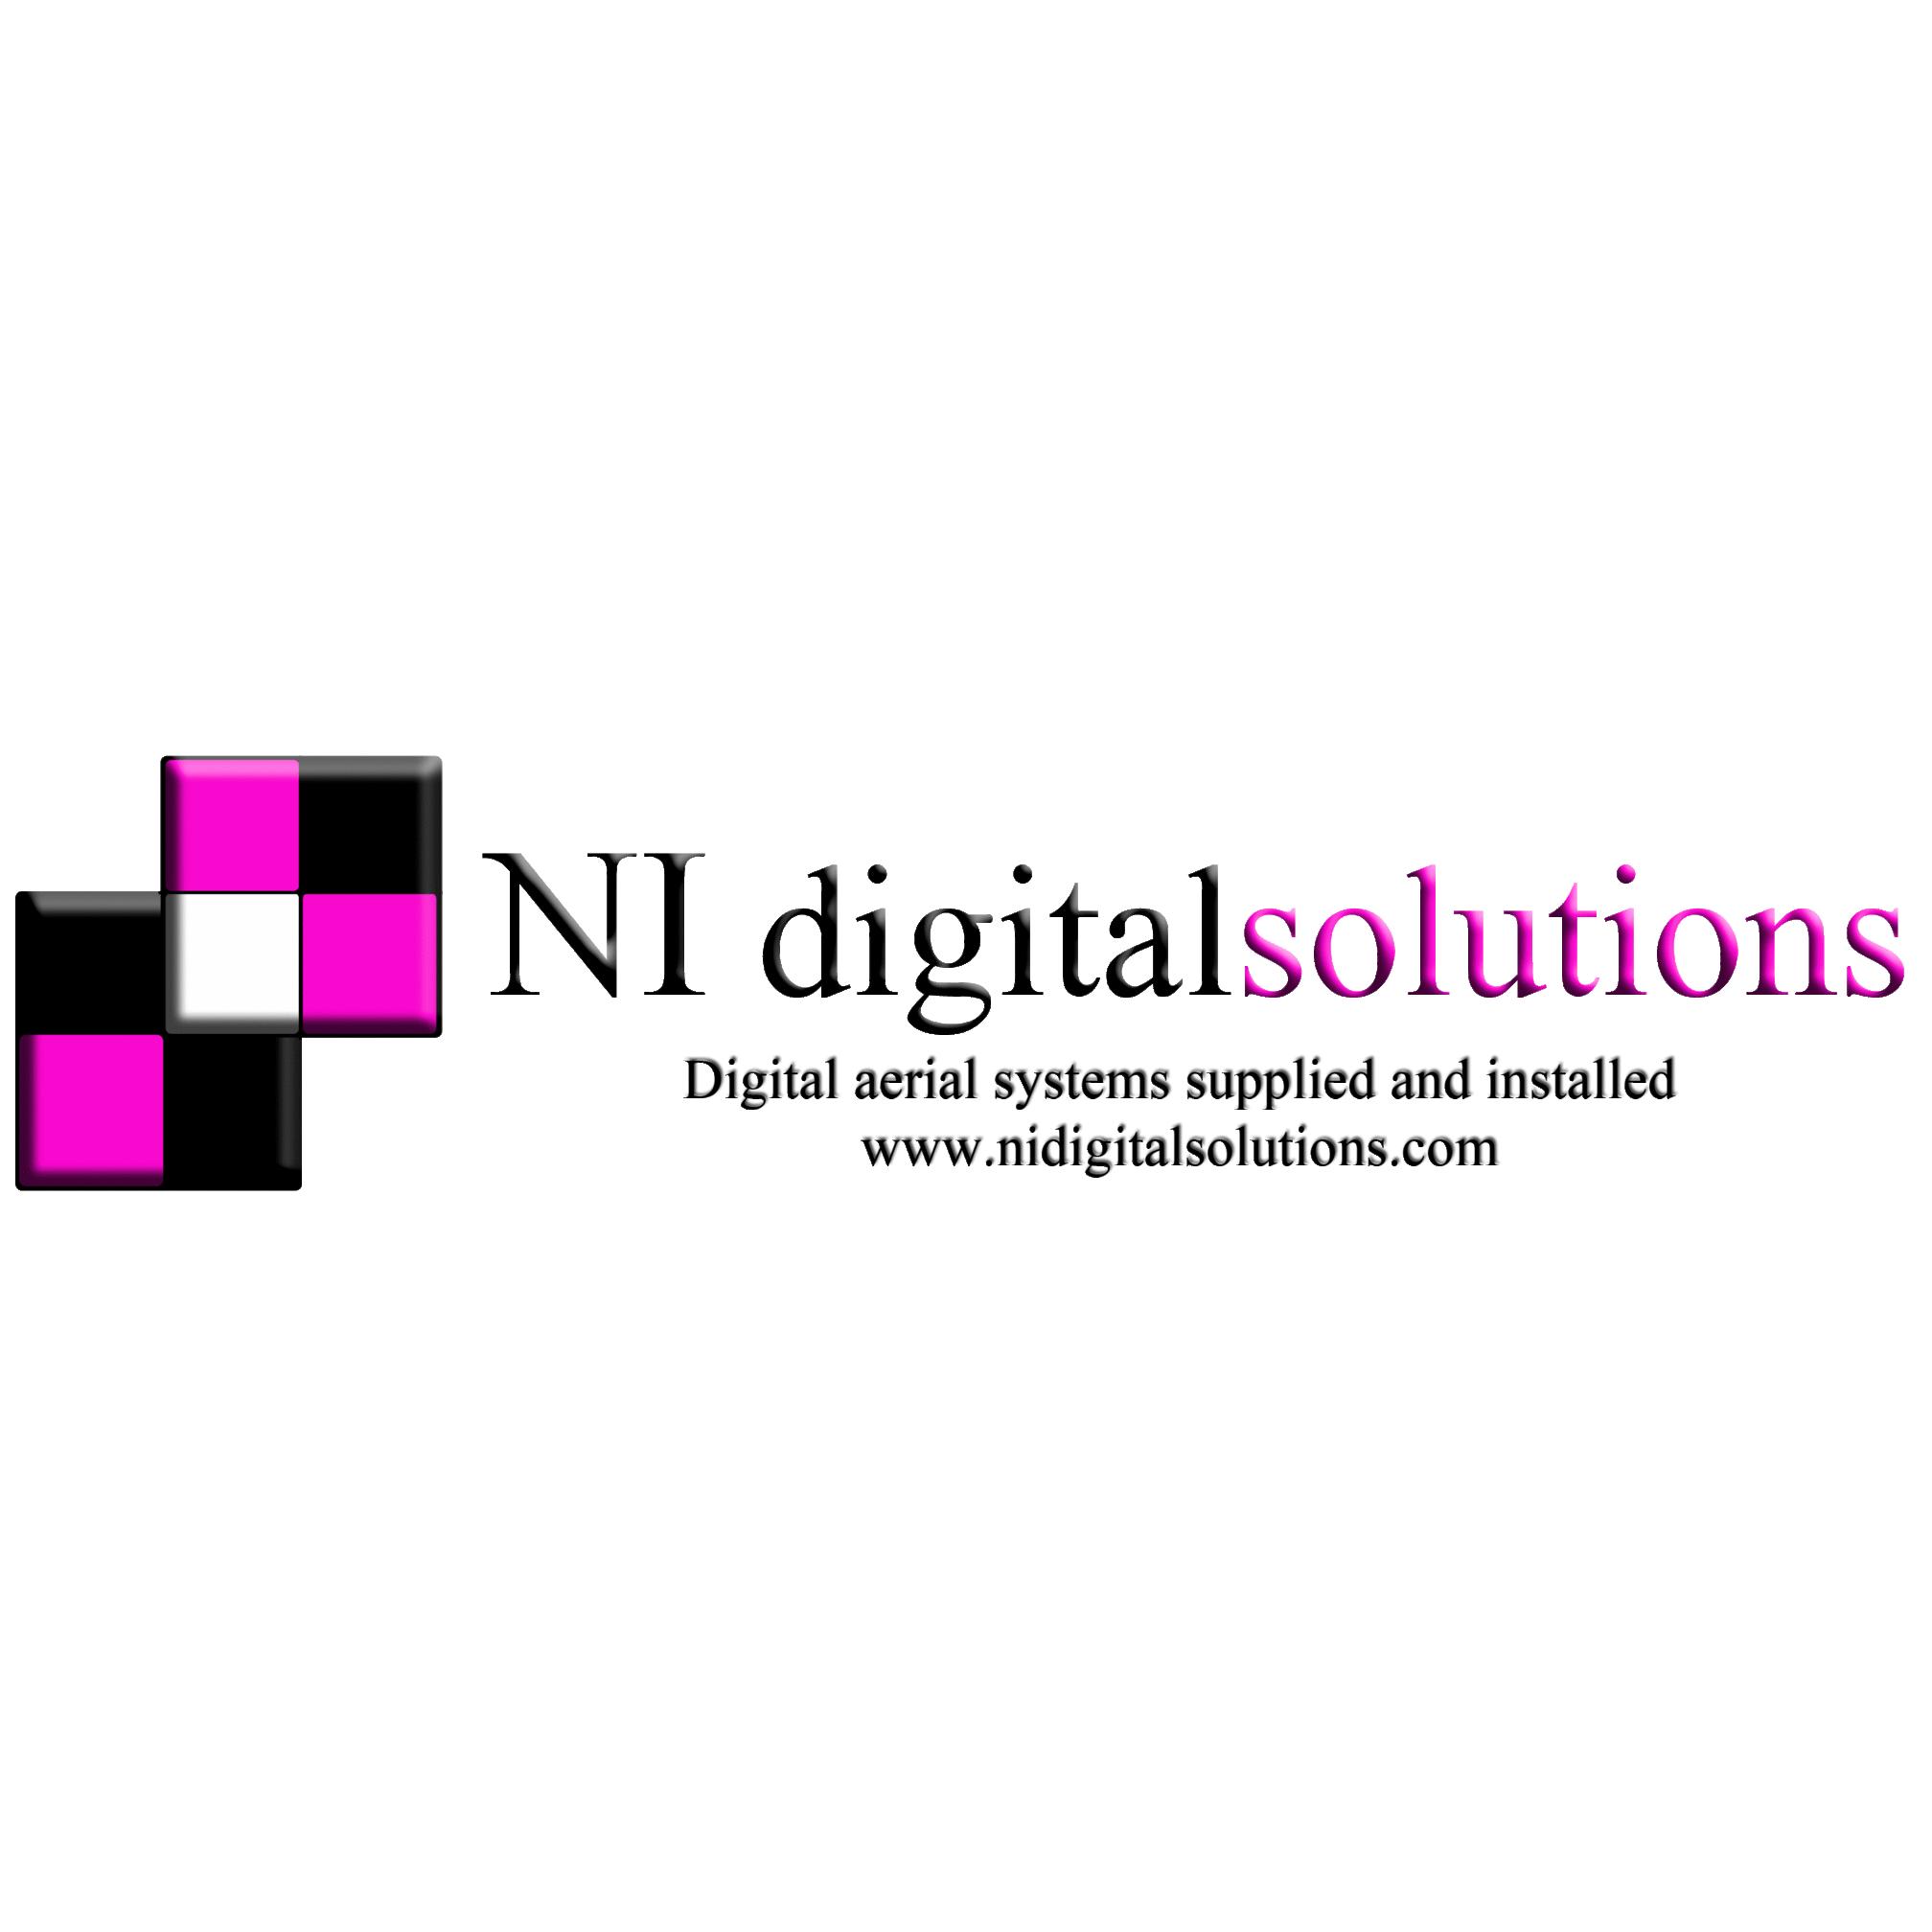 NI Digital Solutions - Newtownabbey, County Antrim BT36 5SD - 07557 503764 | ShowMeLocal.com